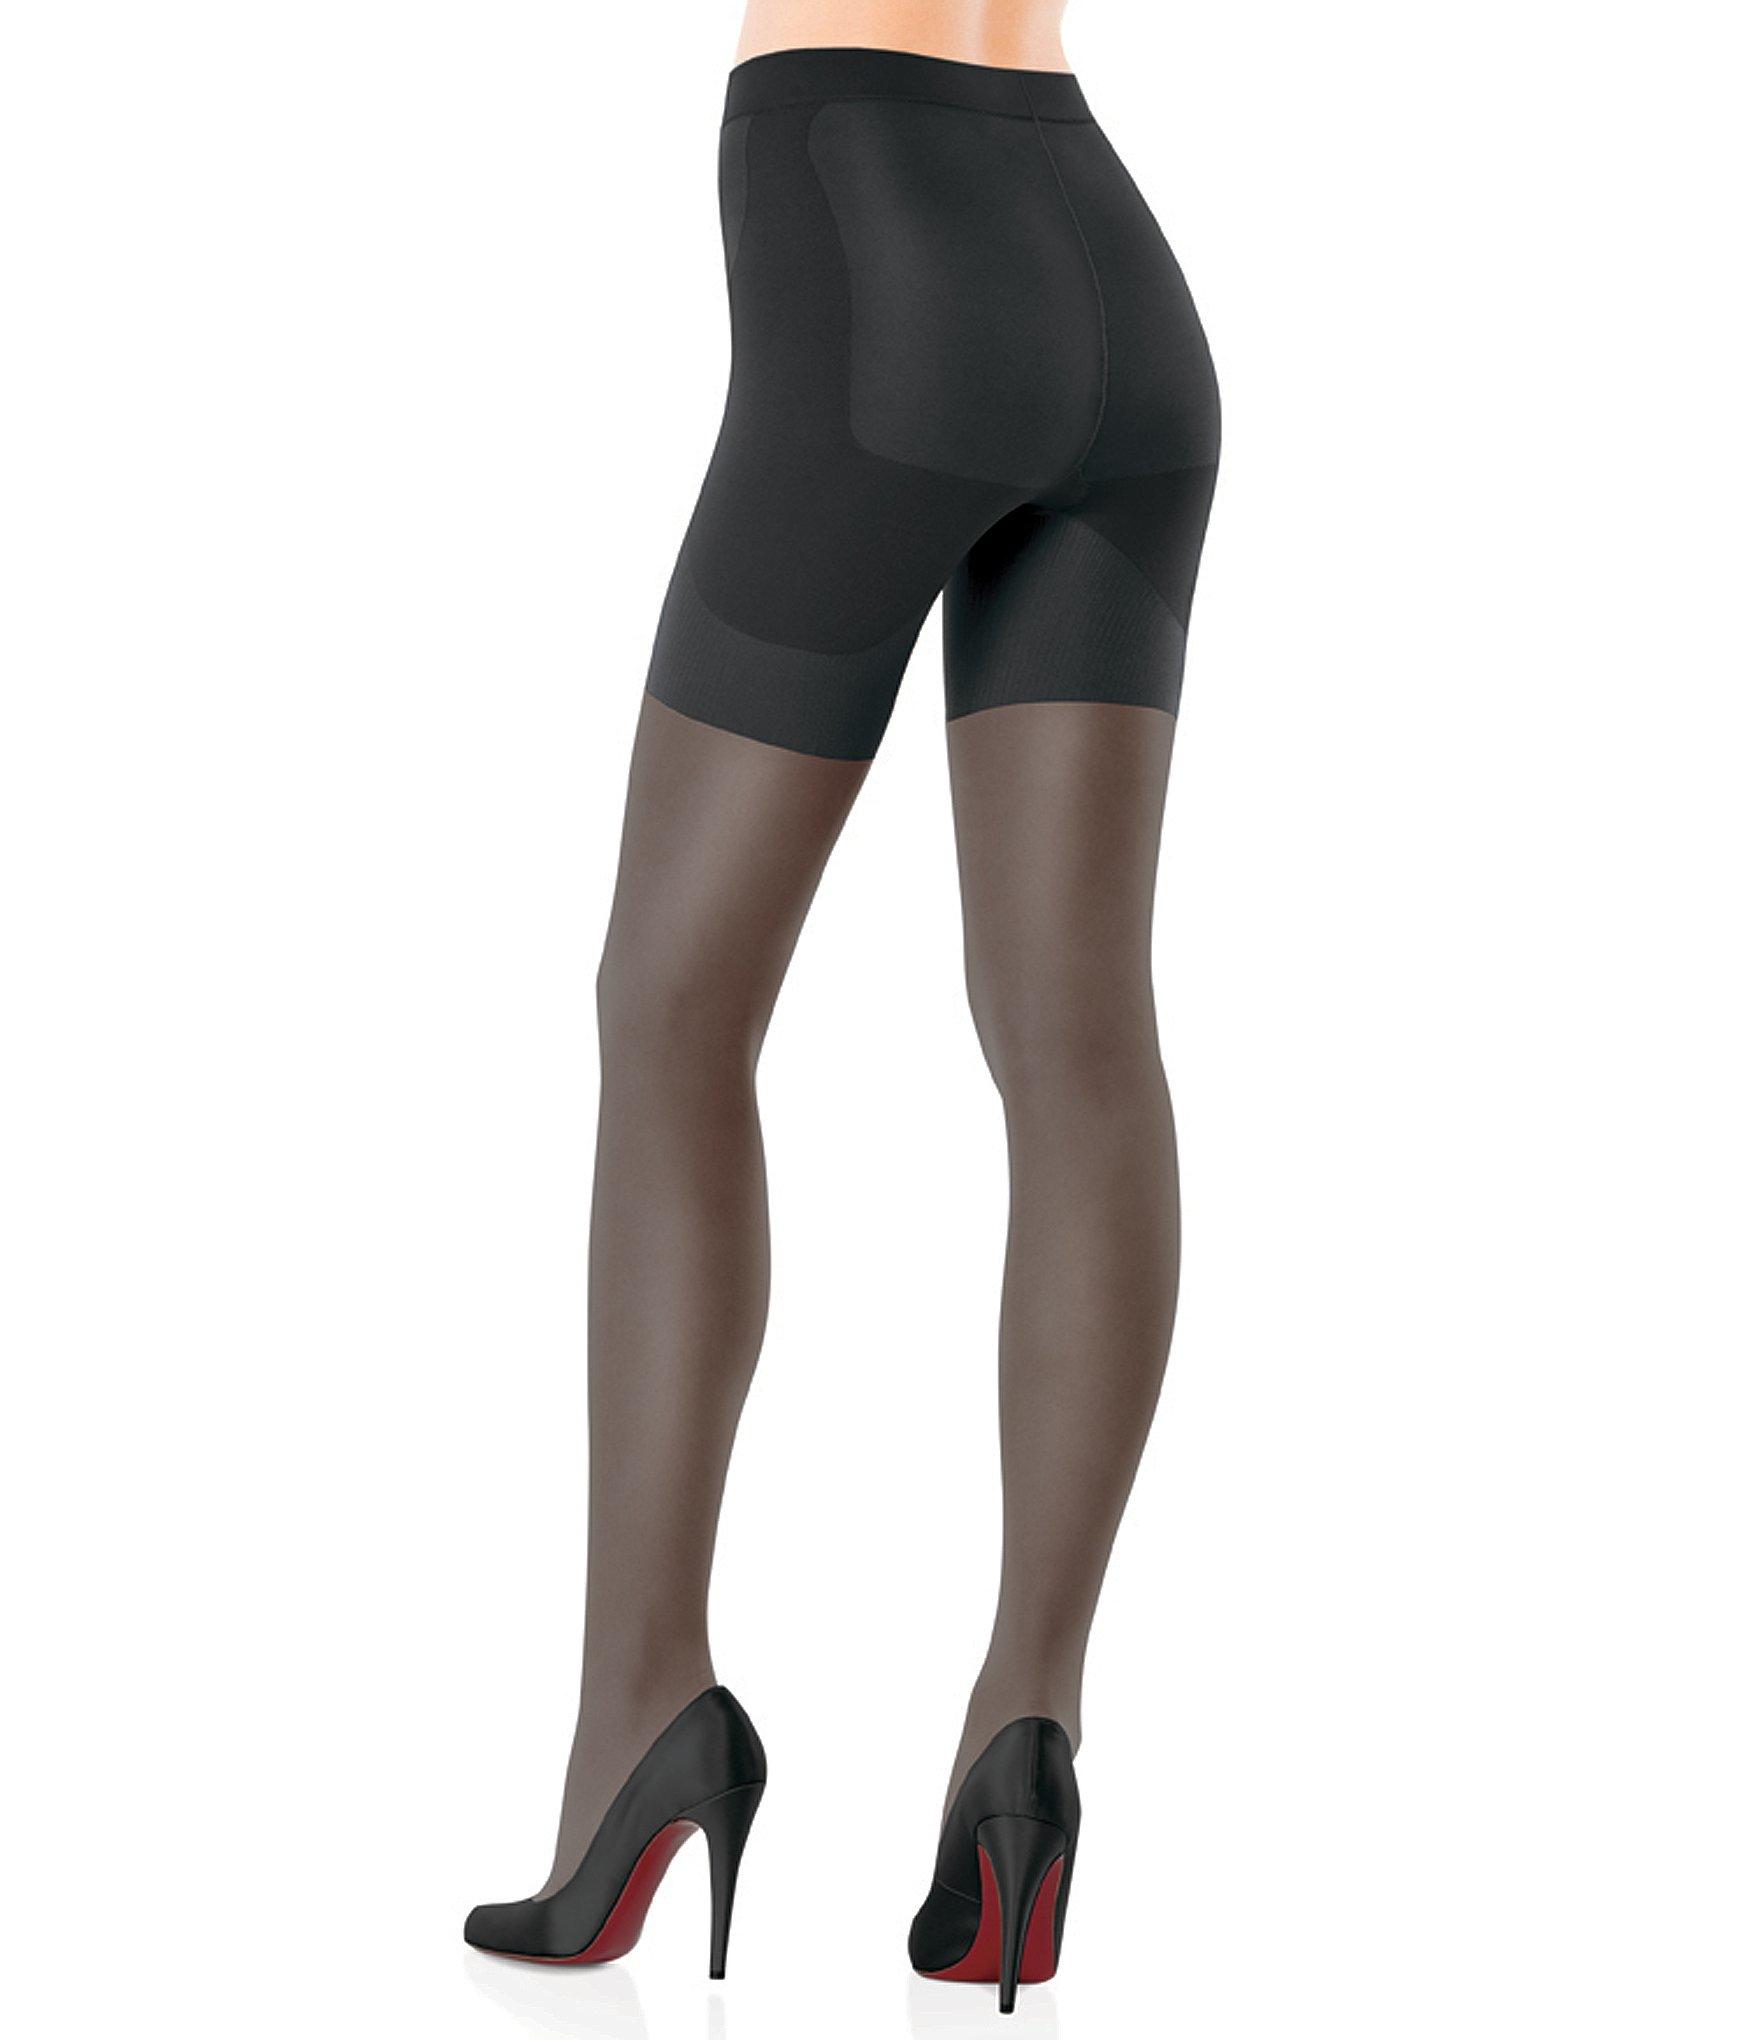 41646983ff2 Lyst - Spanx Booty-full Boosting Reinforced Toe Sheer Pantyhose in Black